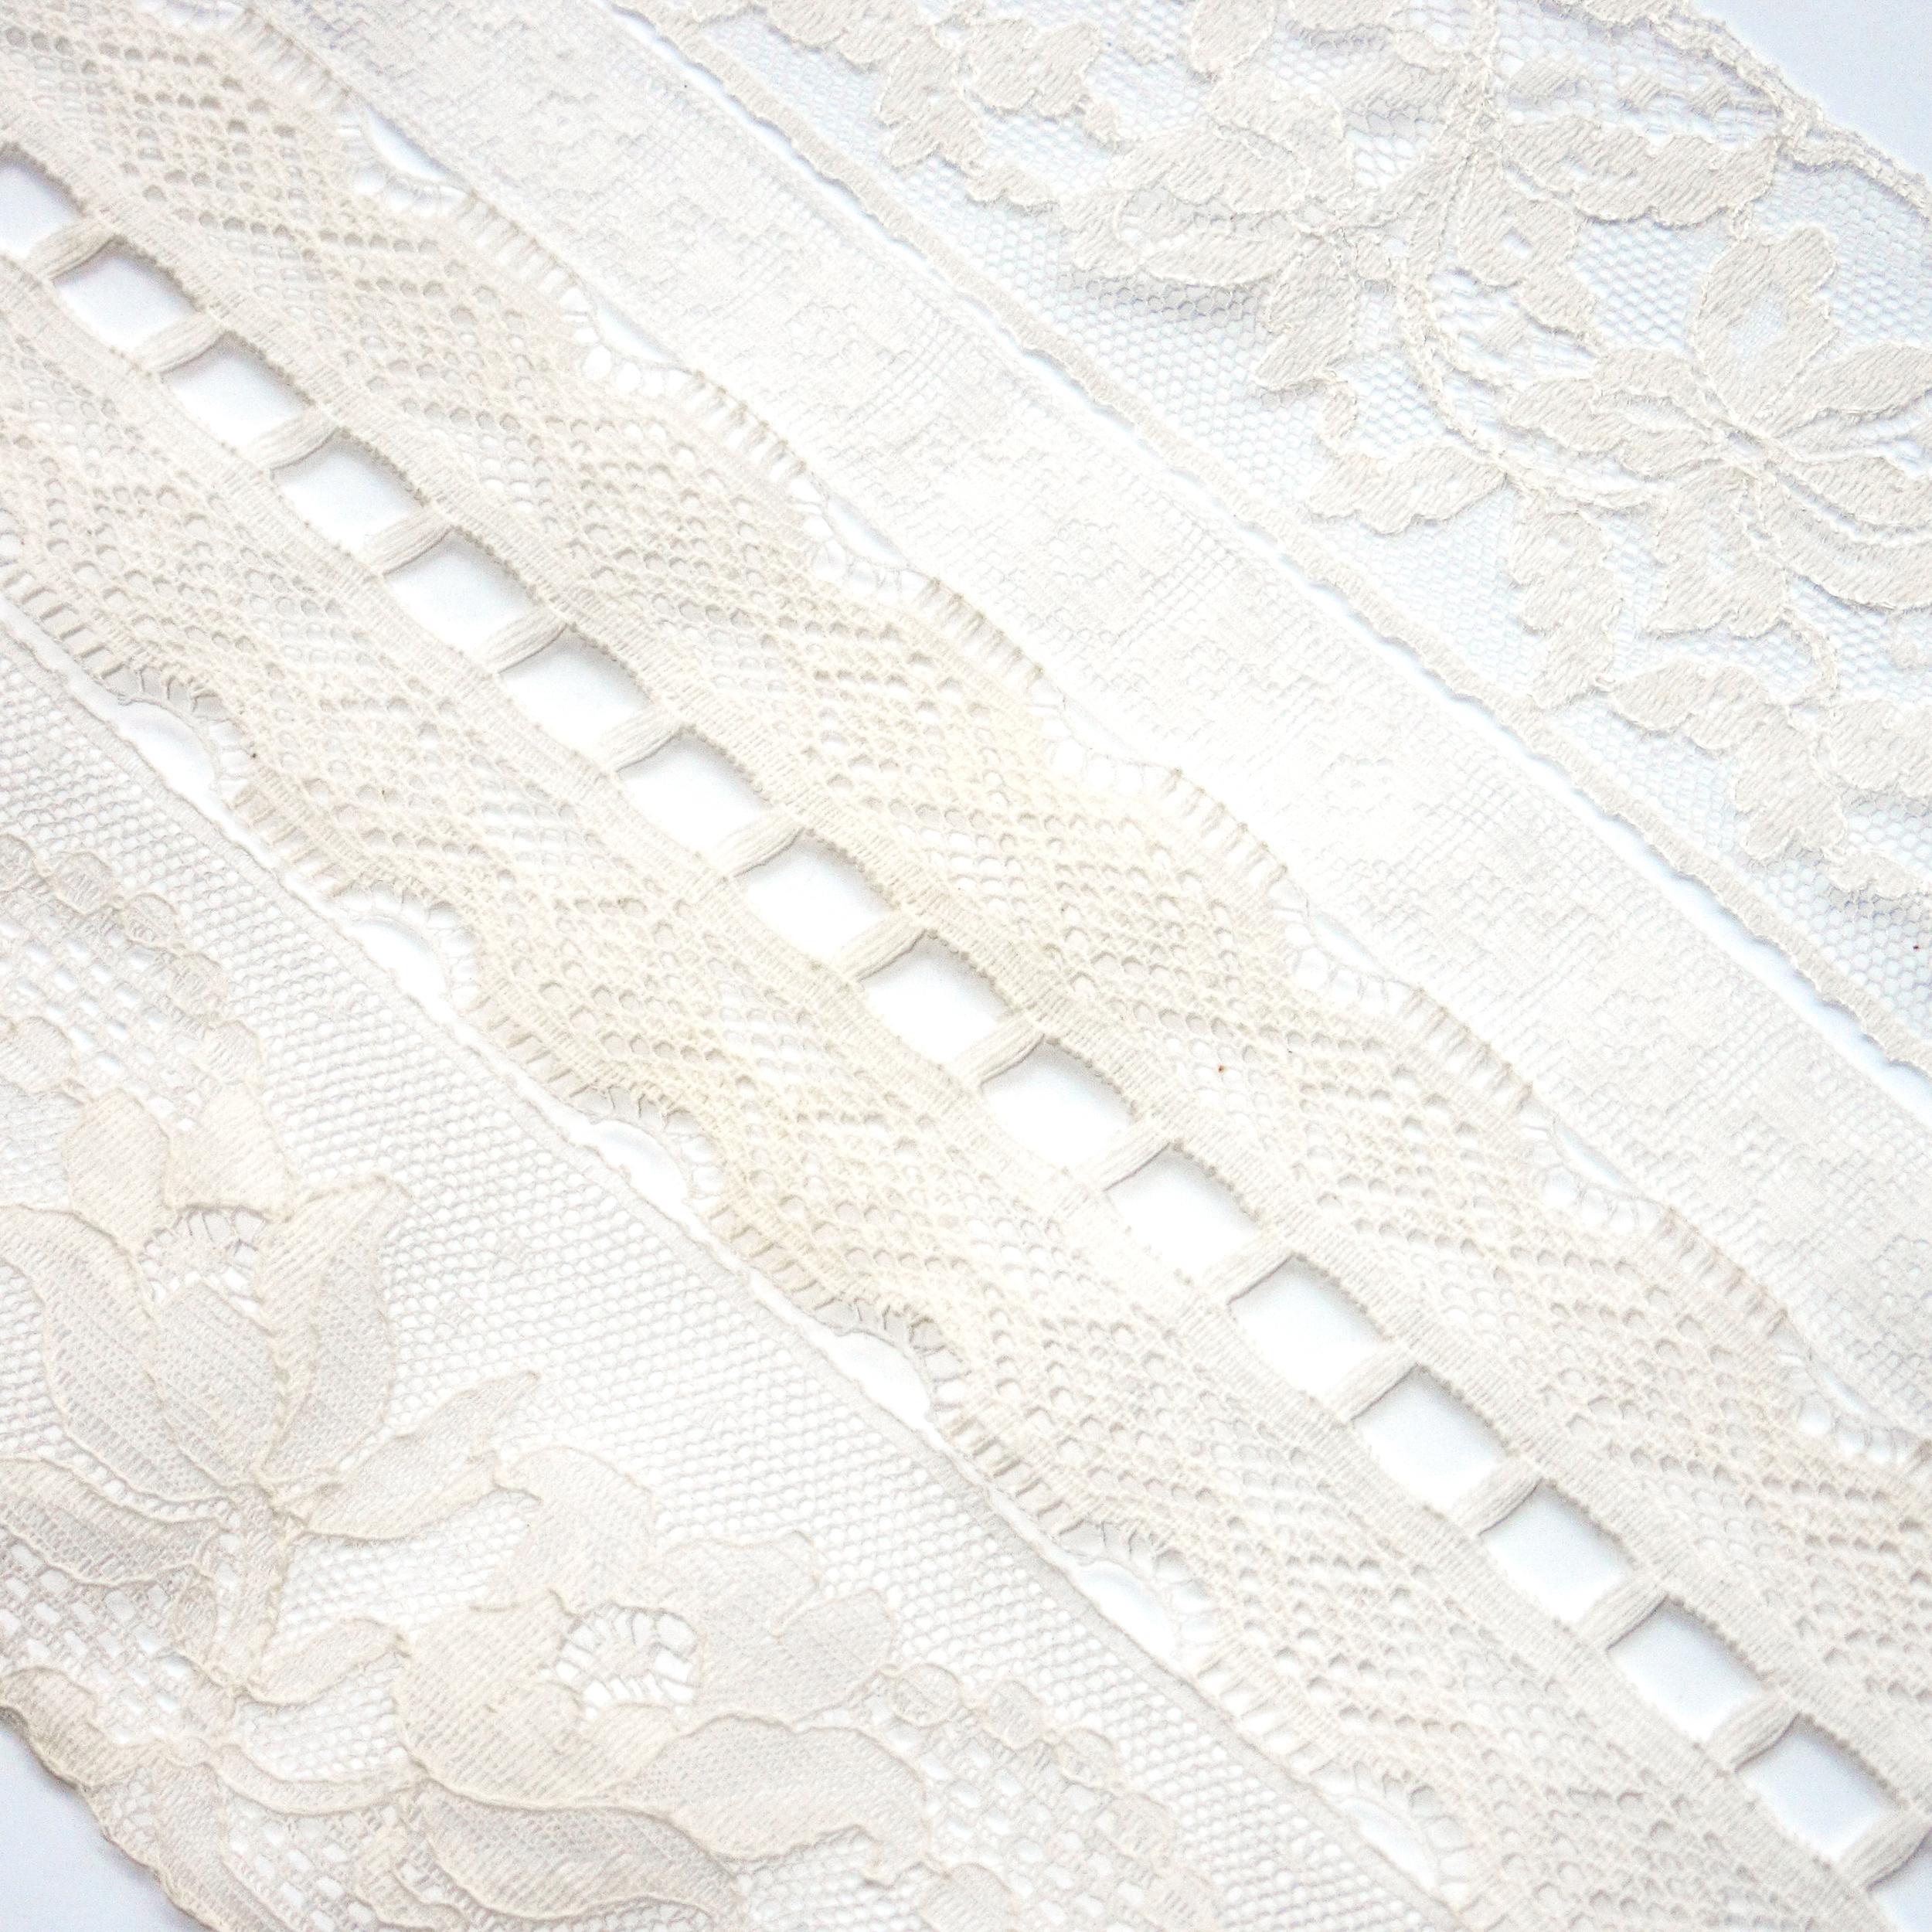 Nylon lace